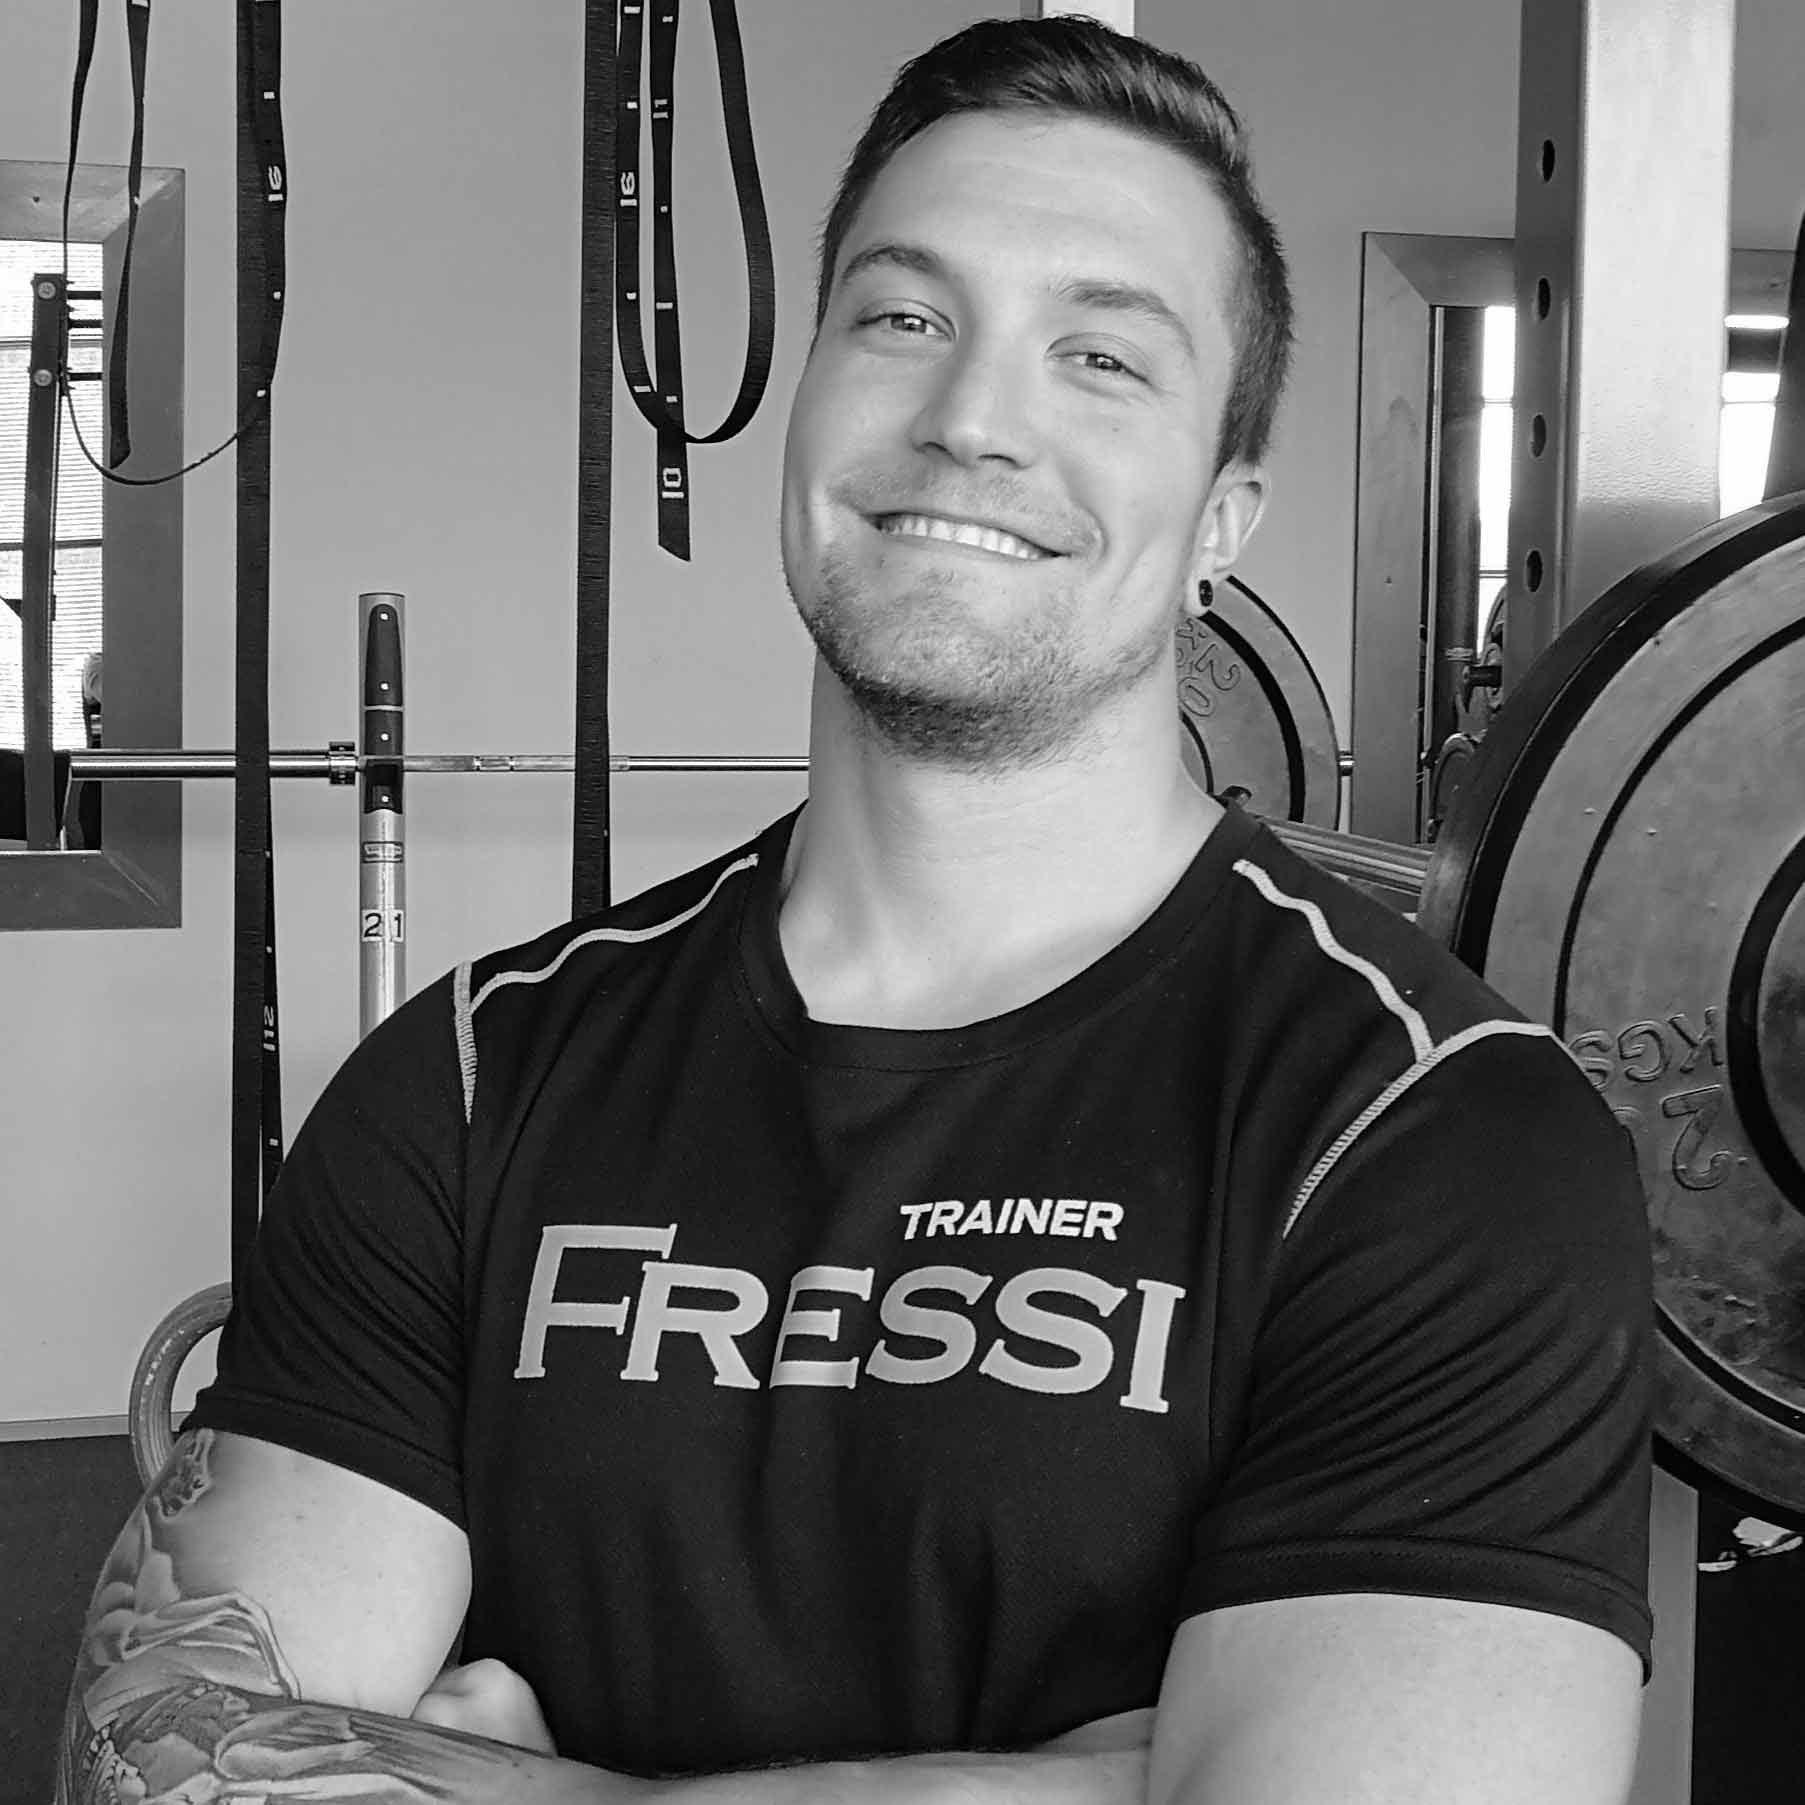 Fressi-Trainer-Roberto_deniz